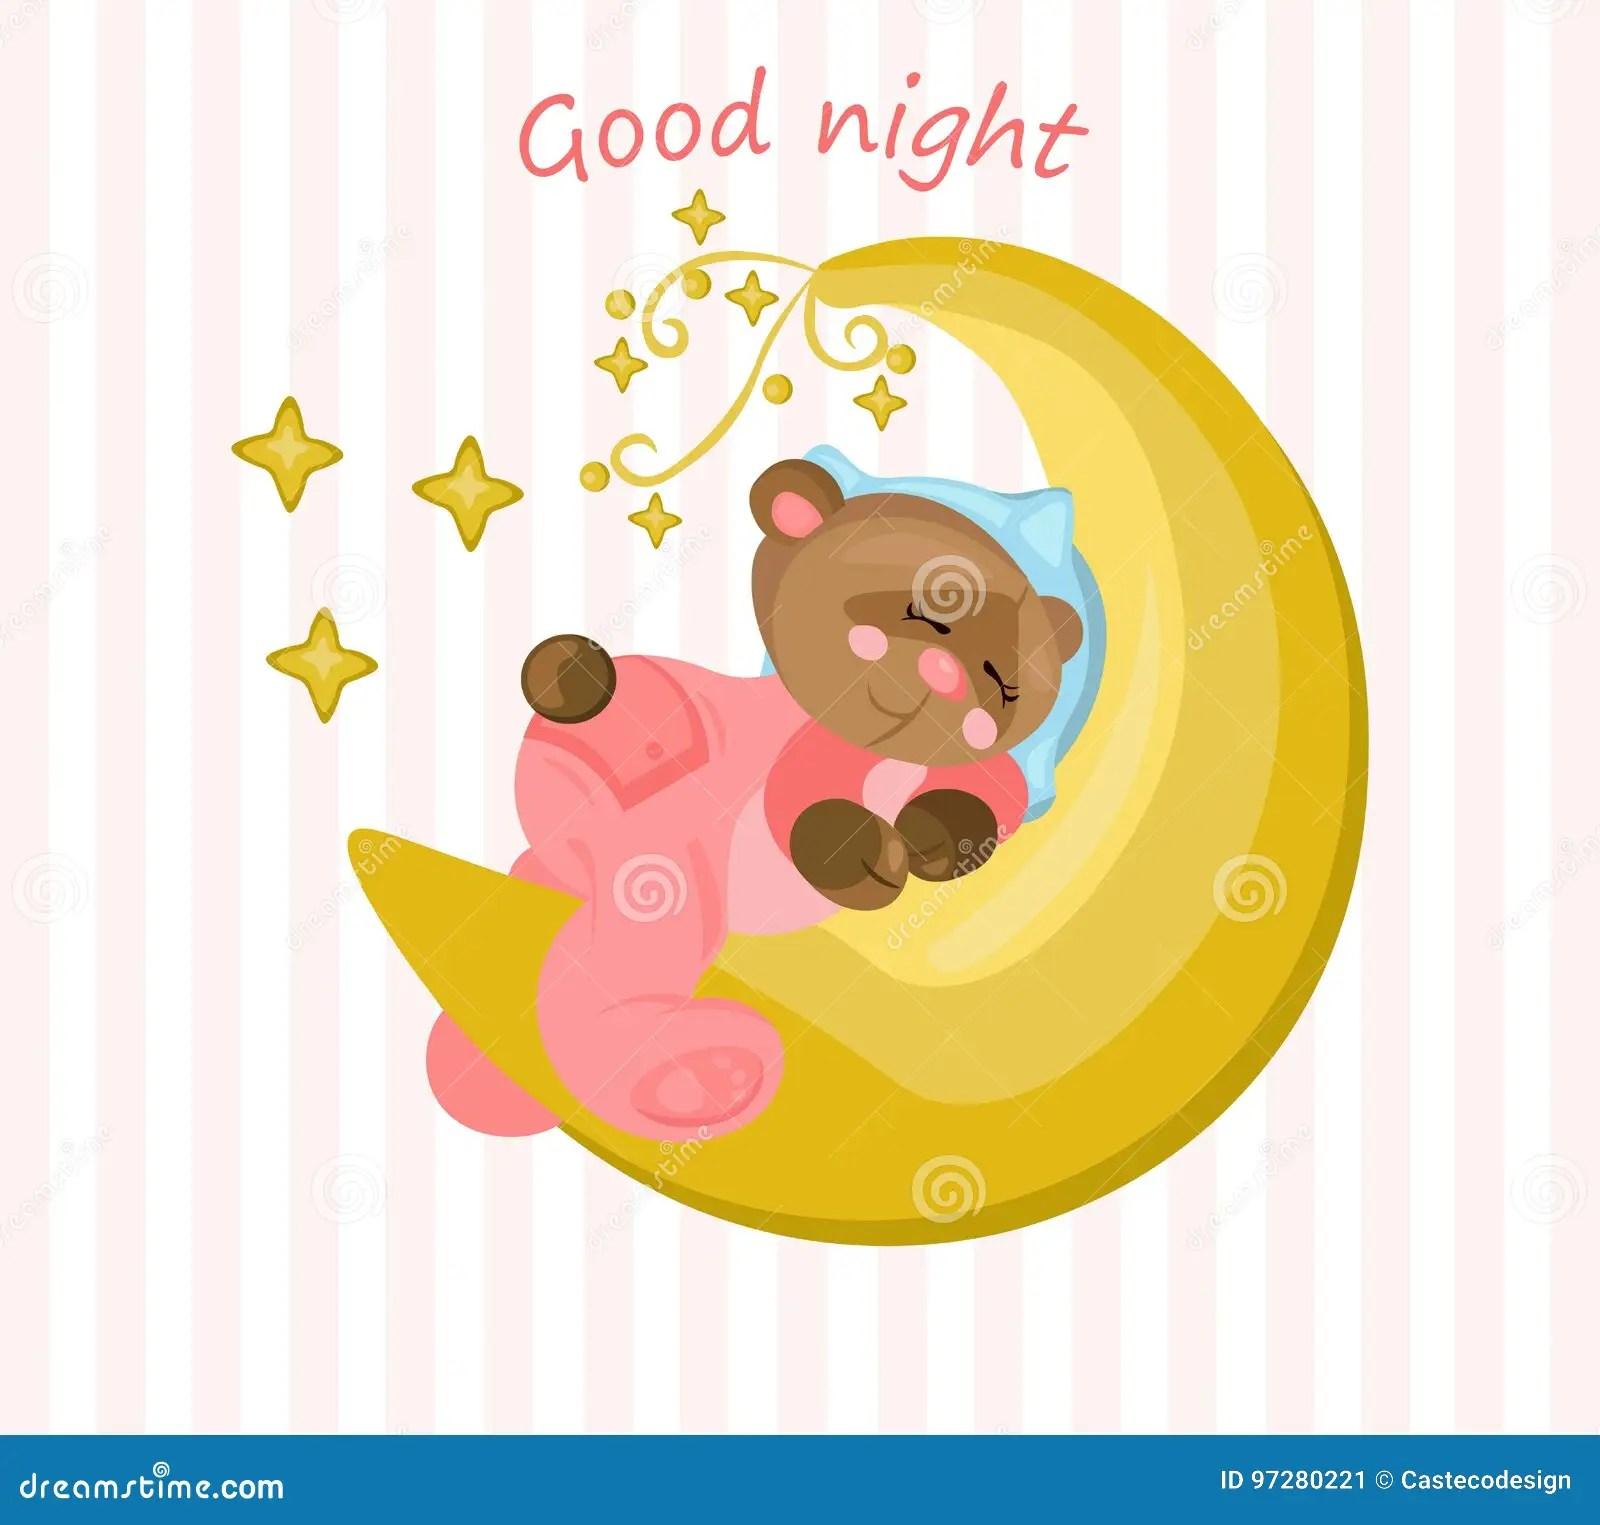 Good Night Card With Teddy Bear Sleeping On The Moon